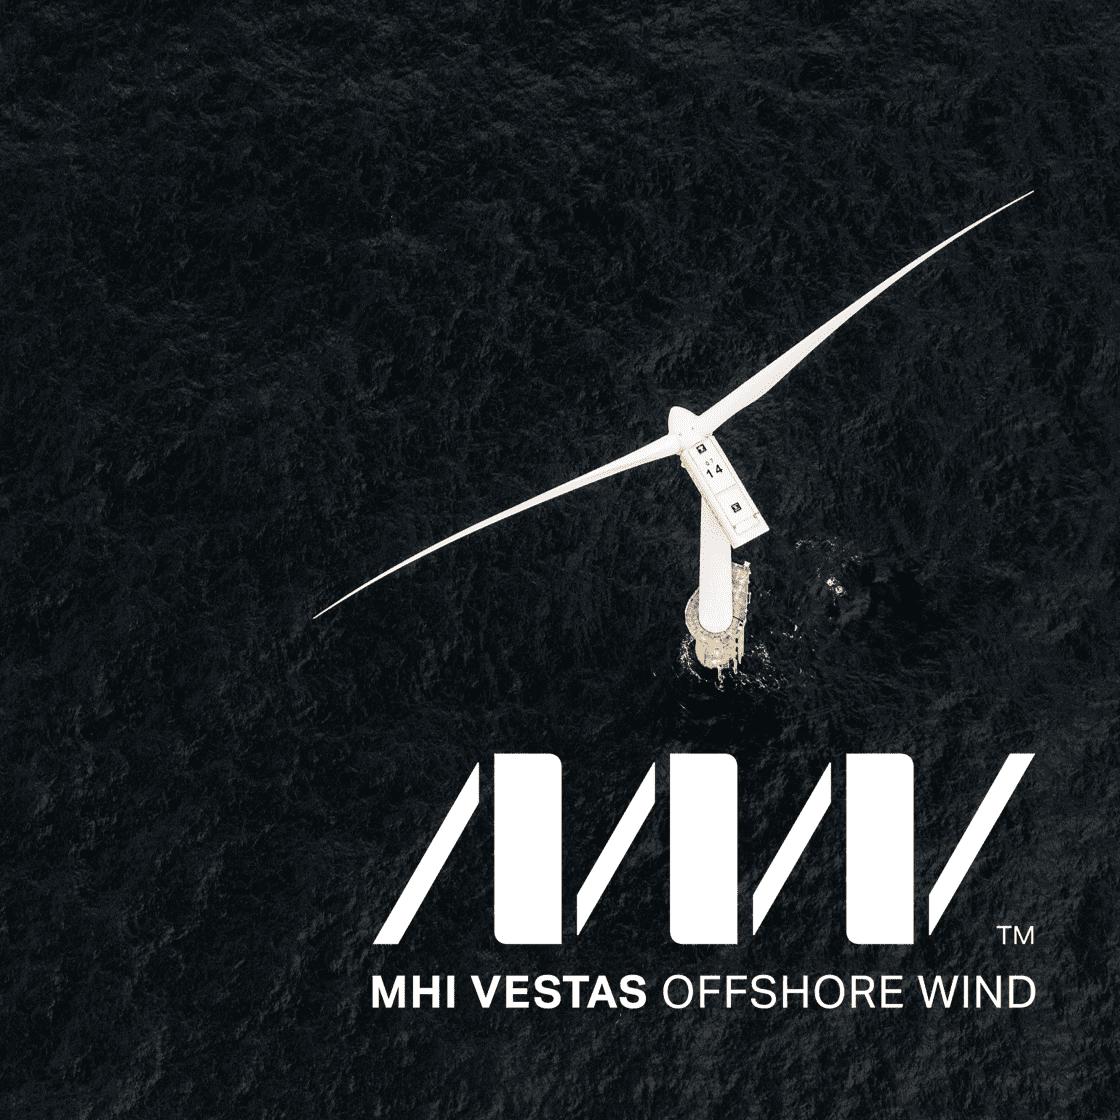 MHI Vestas thumbnail |Projectum customer success story